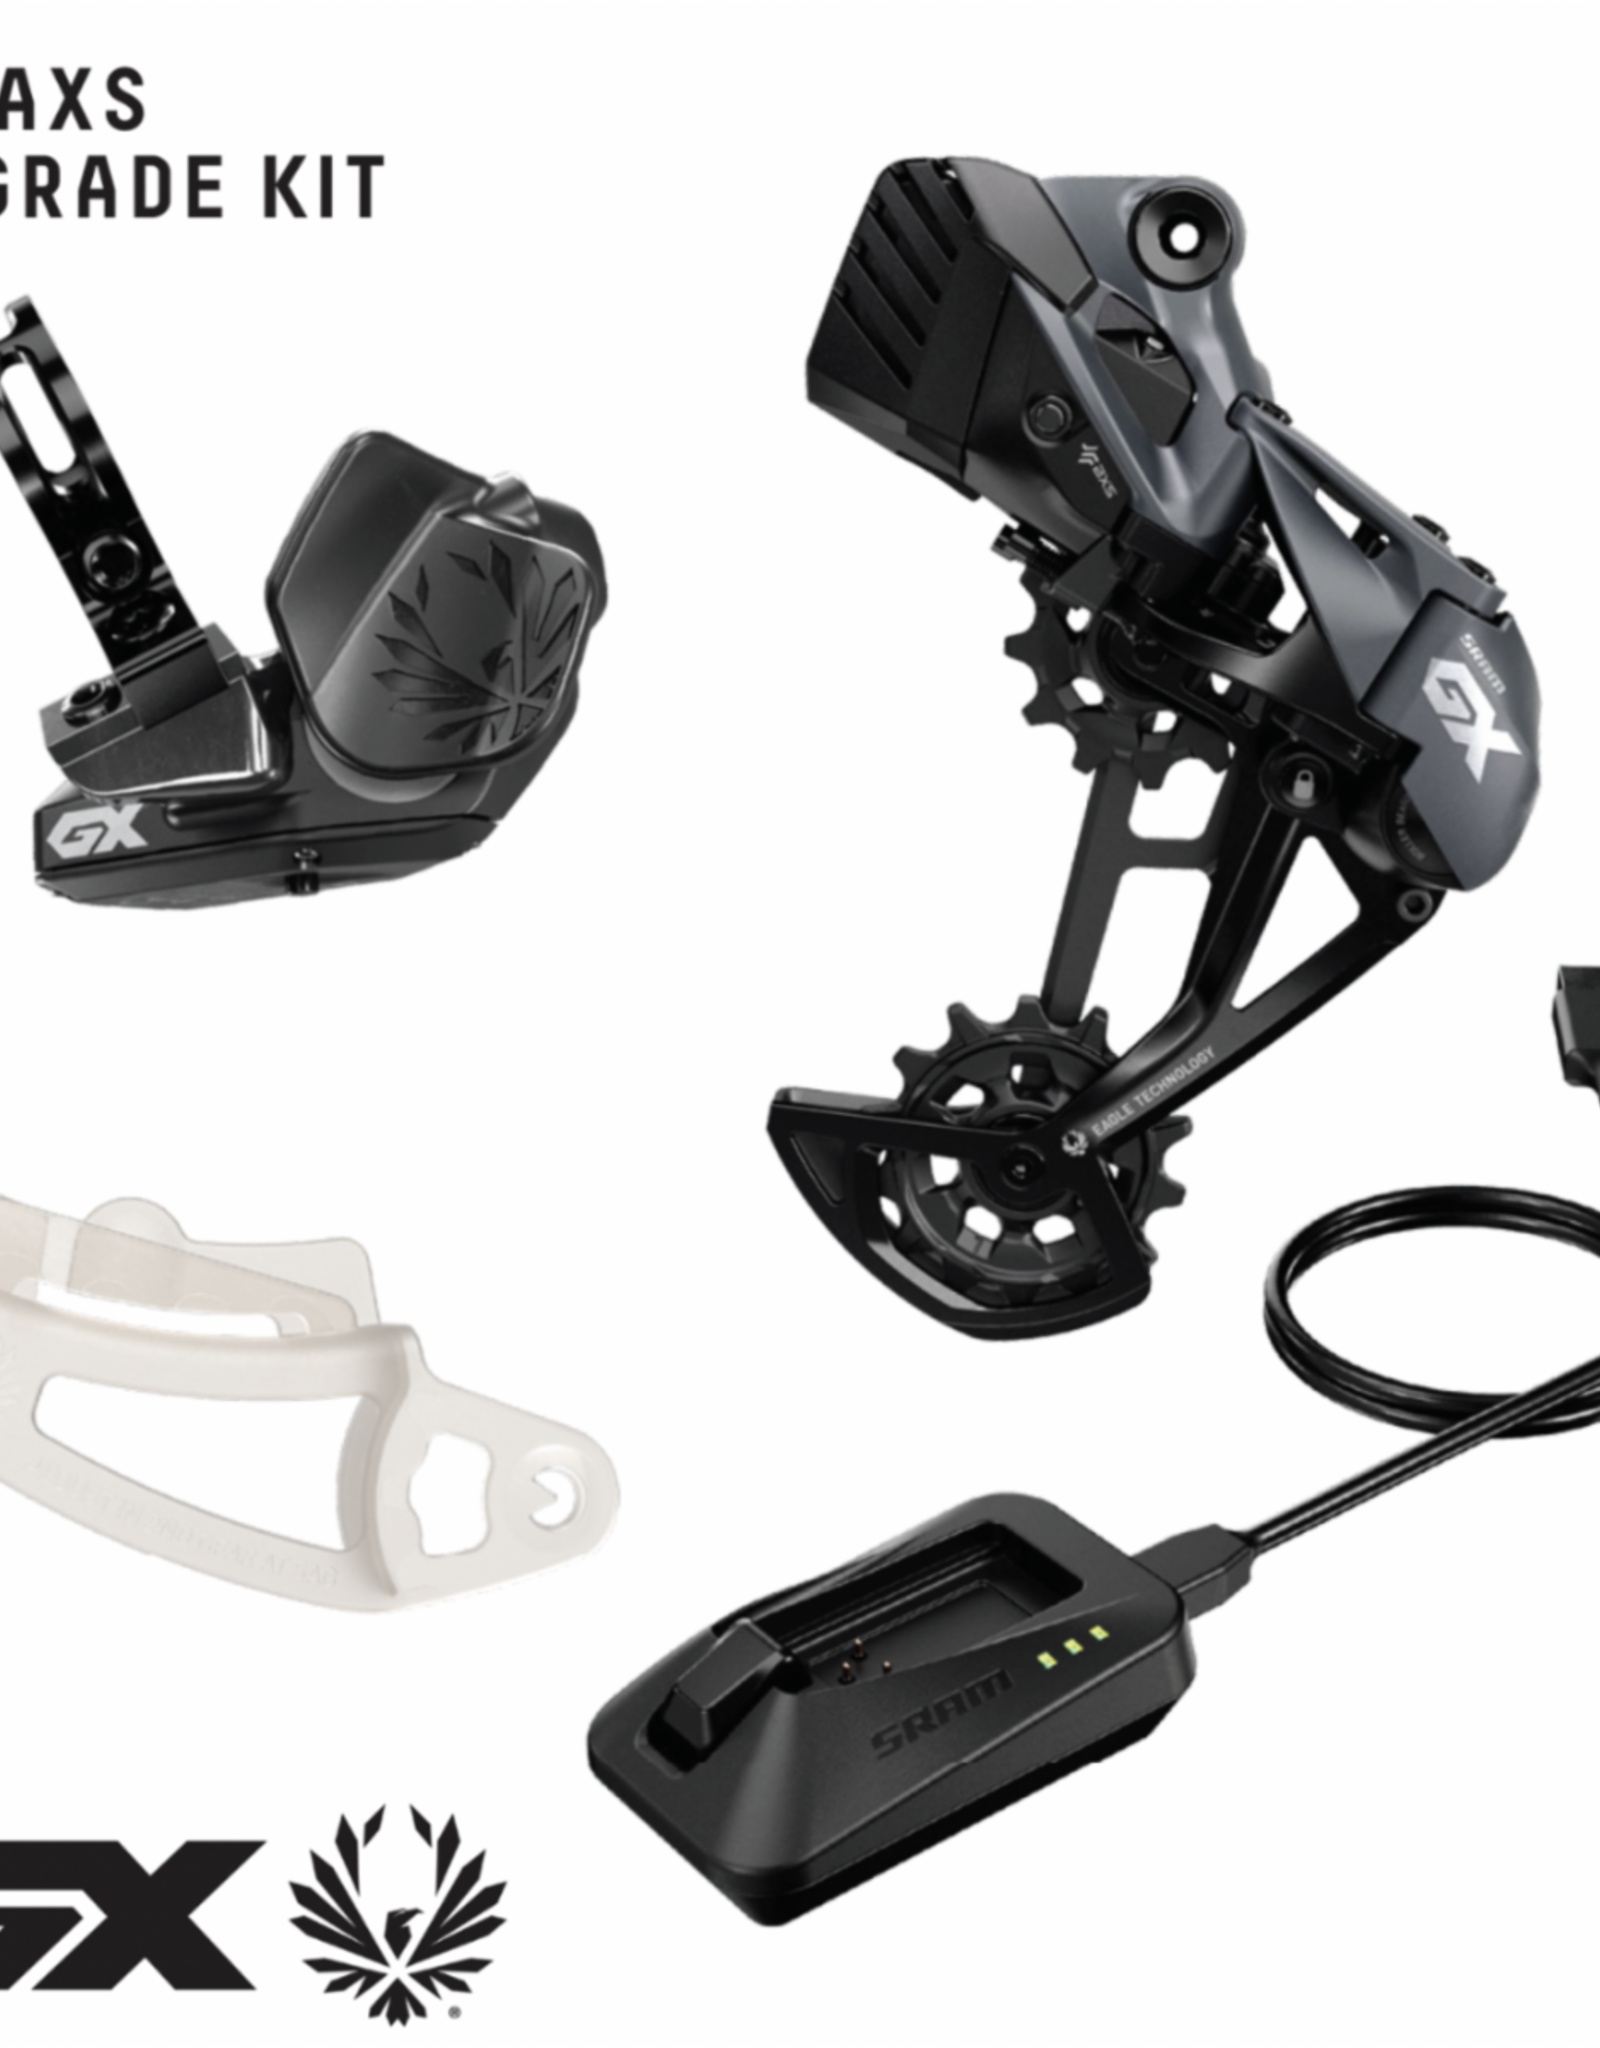 SRAM GX Eagle AXS Upgrade Kit (Rear Derailleur, Battery, Controller)